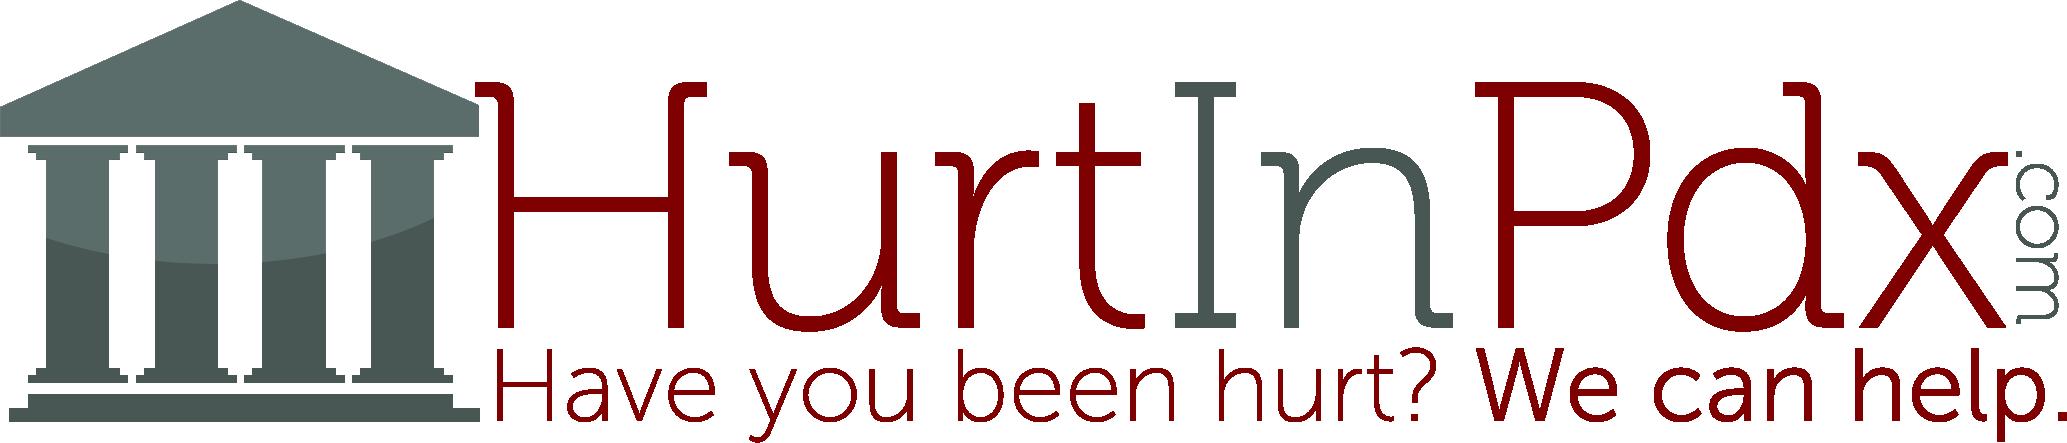 Portland Personal Injury Attorneys image 1